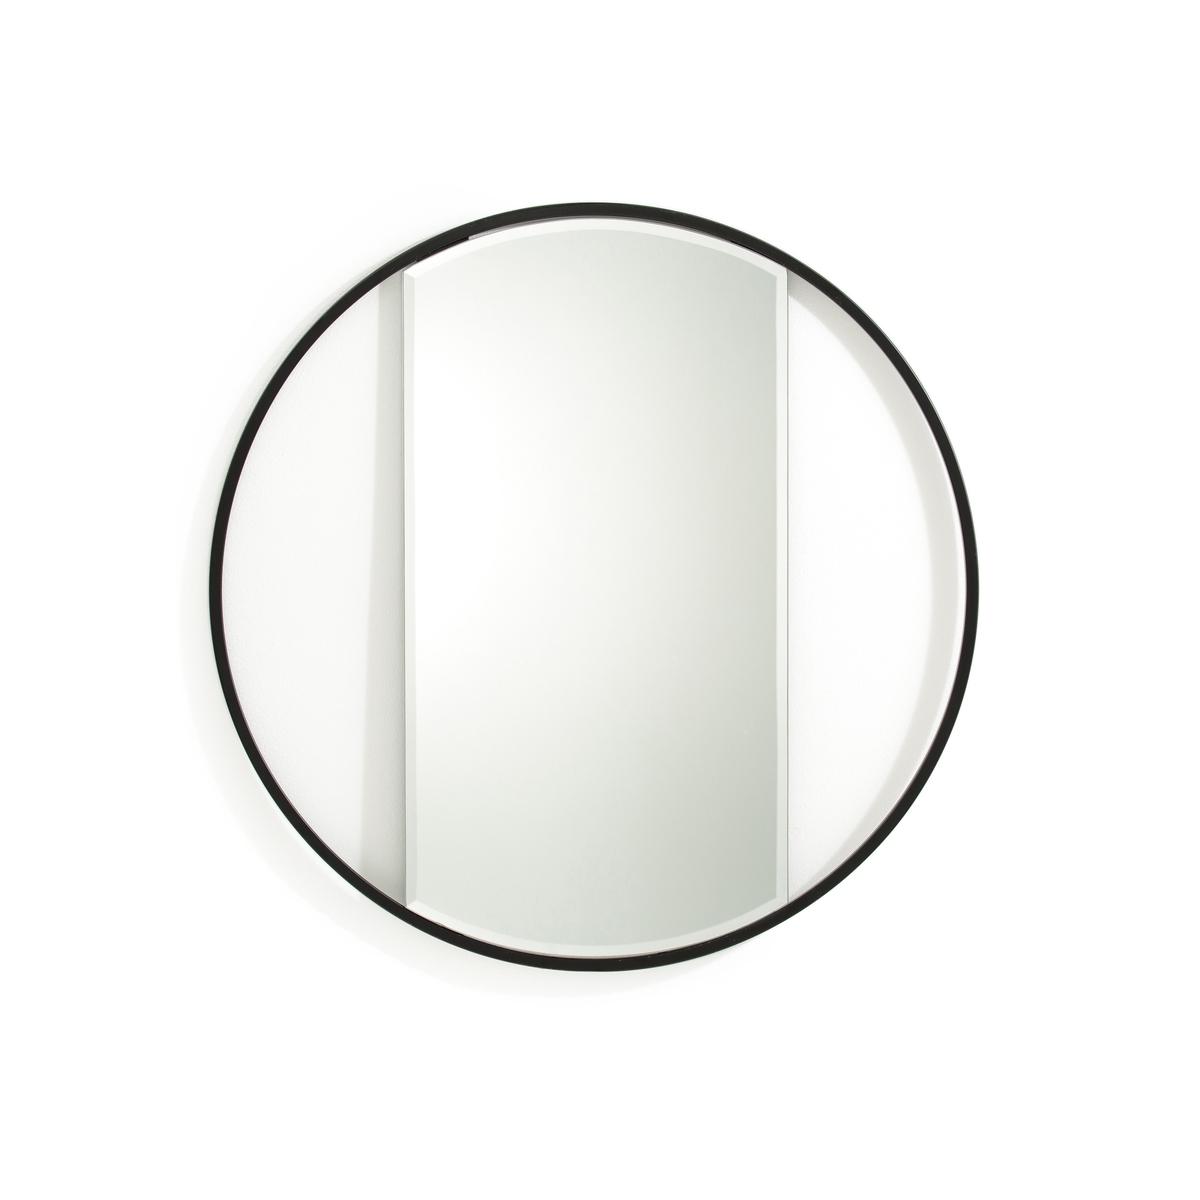 Зеркало круглое, REFLET